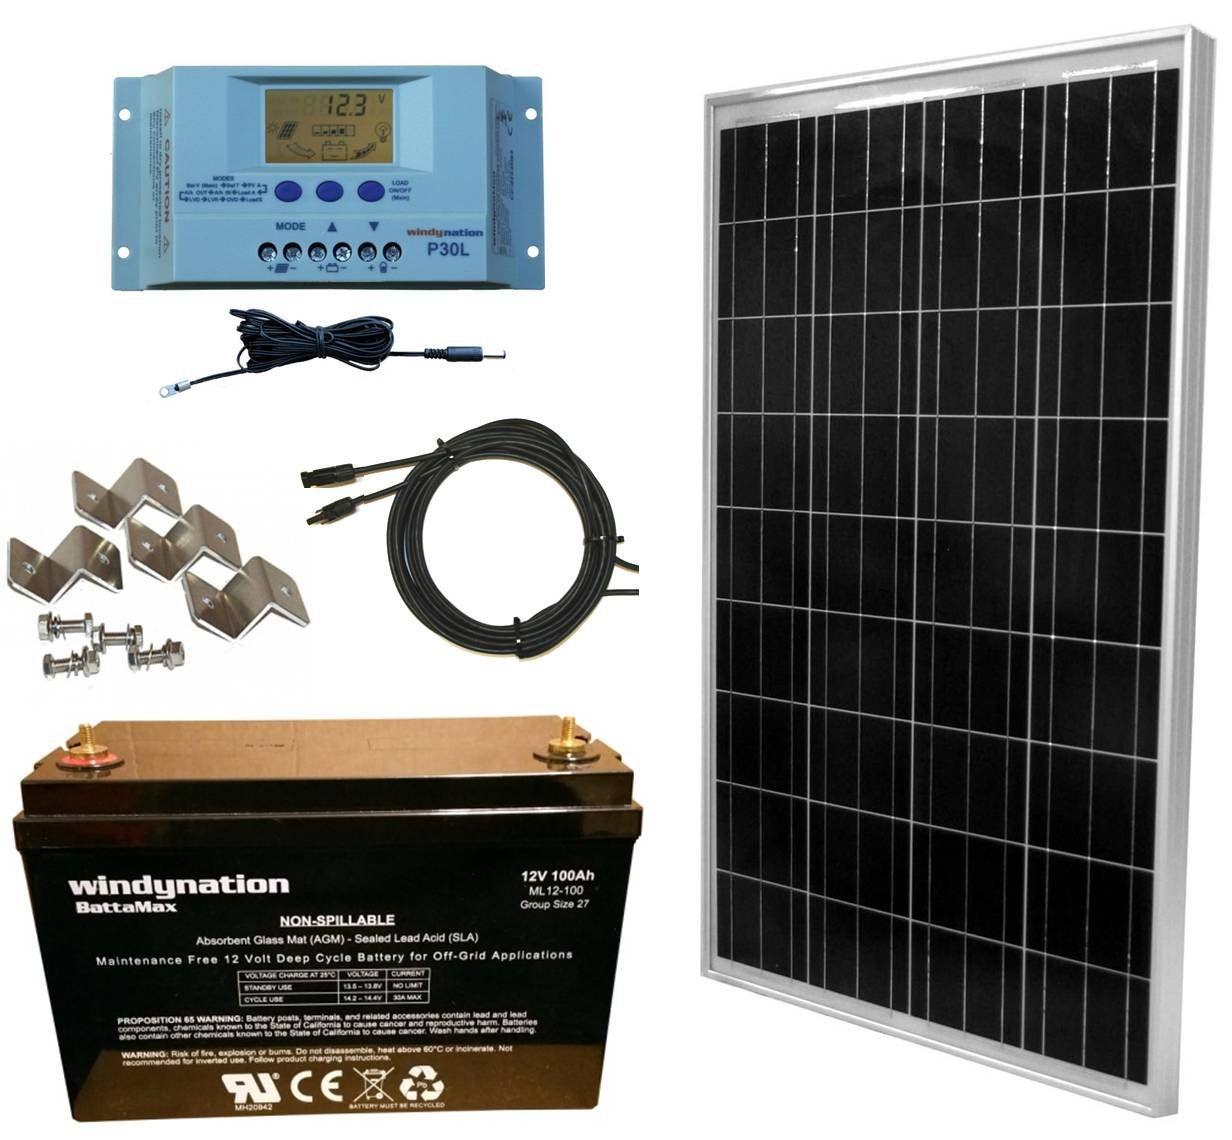 WindyNation 100 Watt Solar Panel Complete OffGrid RV Boat